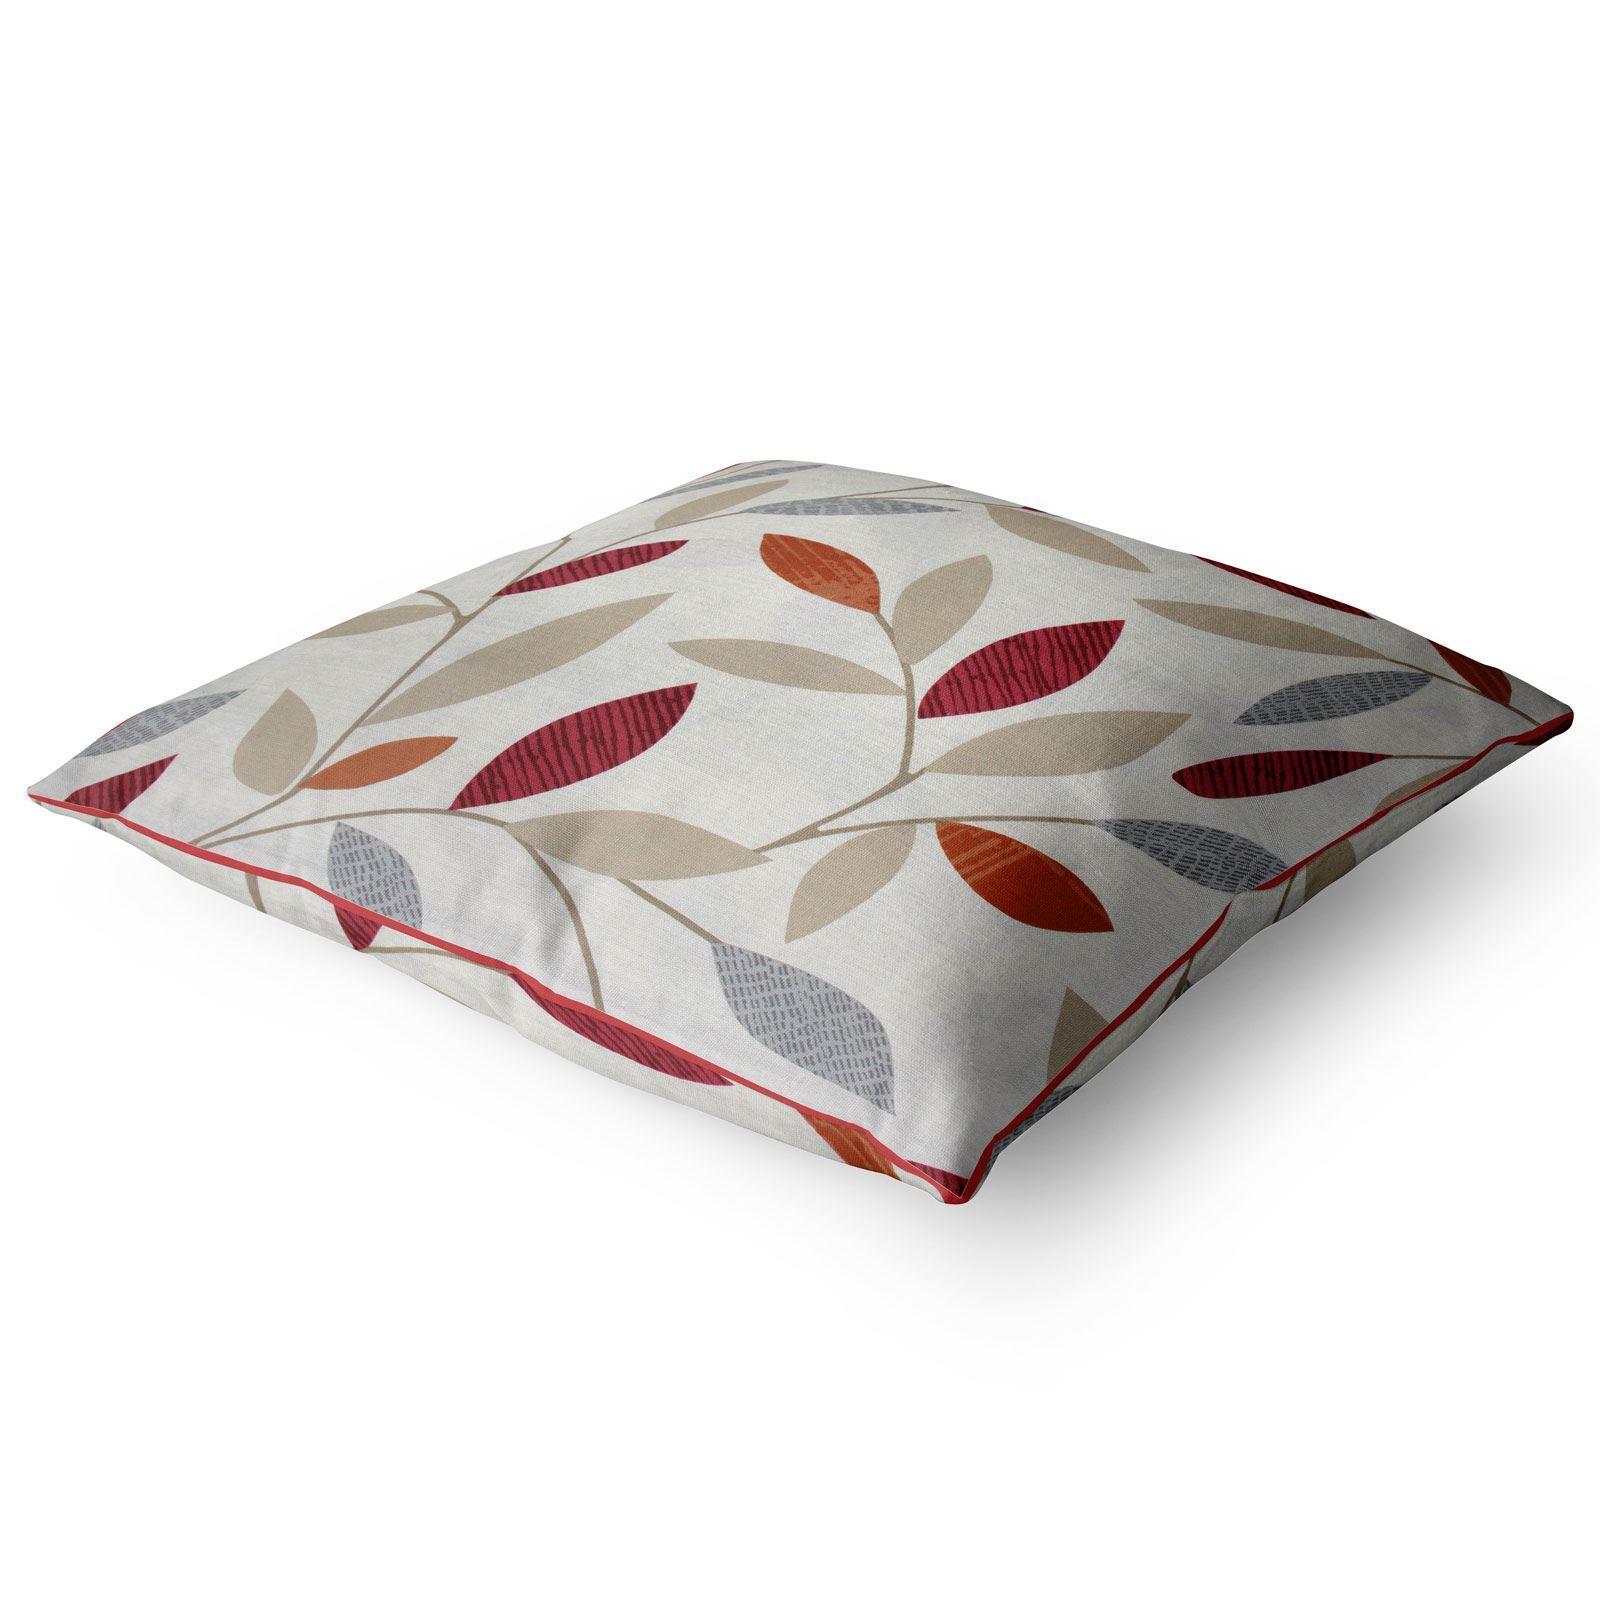 Vino-Tinto-Cushion-Covers-Coleccion-17-034-18-034-43cm-45cm-Cubierta miniatura 44